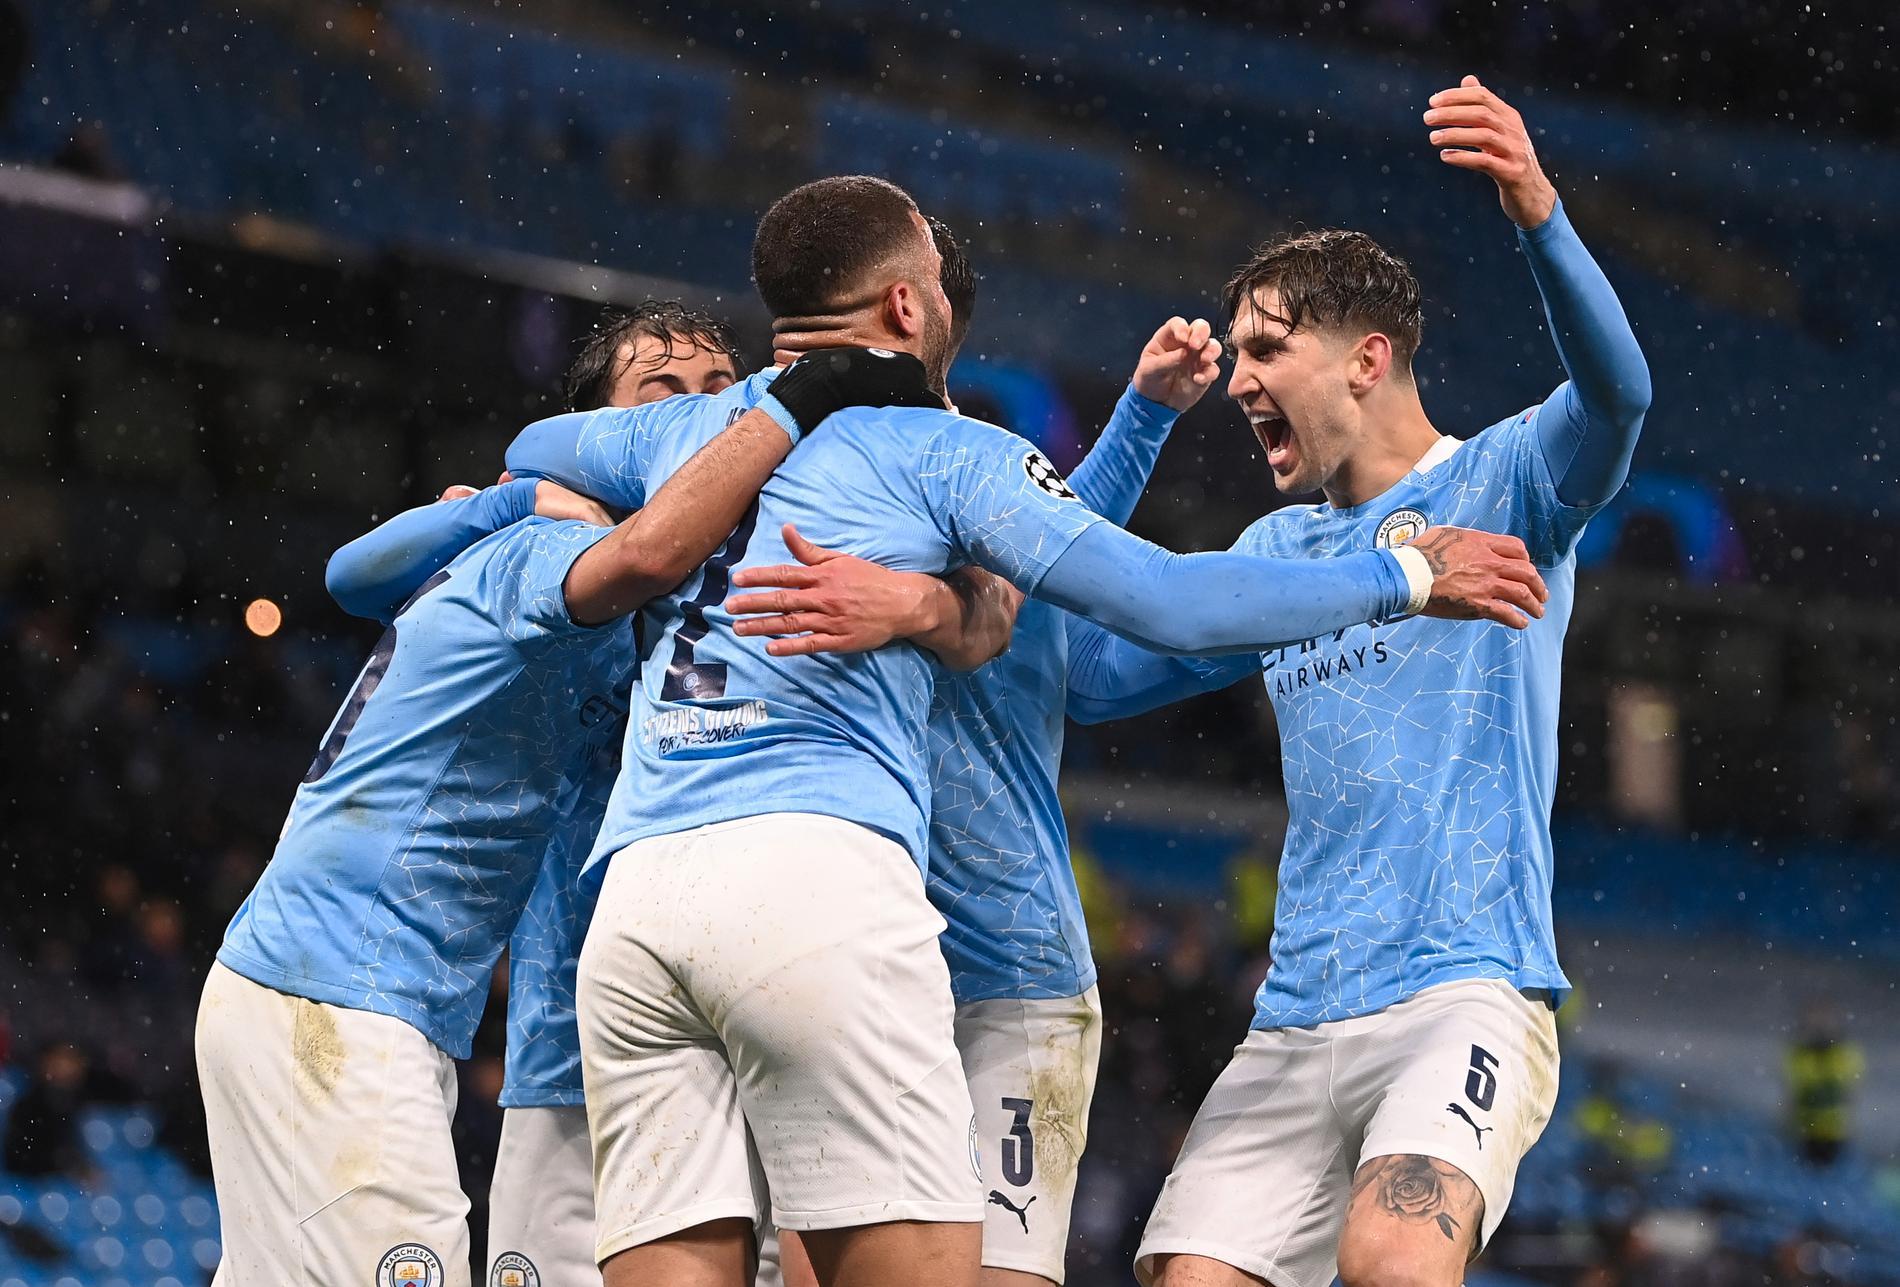 Manchester City spelar sin första Champions League-final.